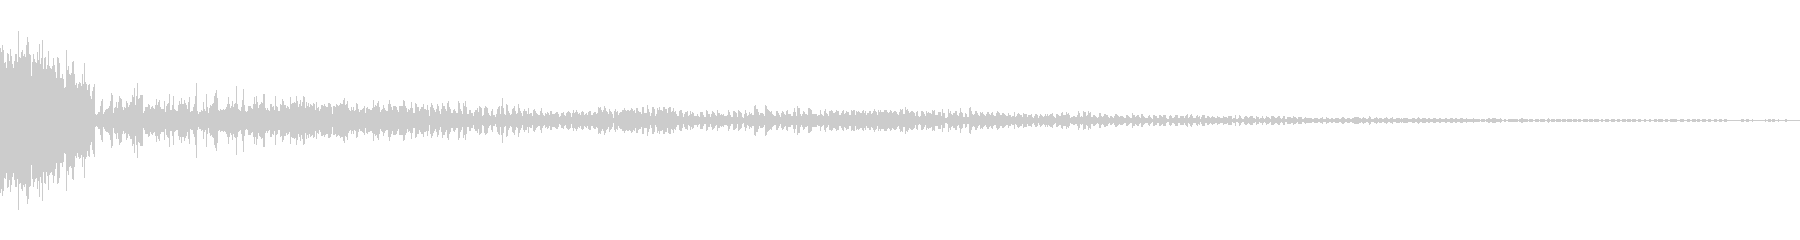 SciFi EC01_83_2の未再生の波形